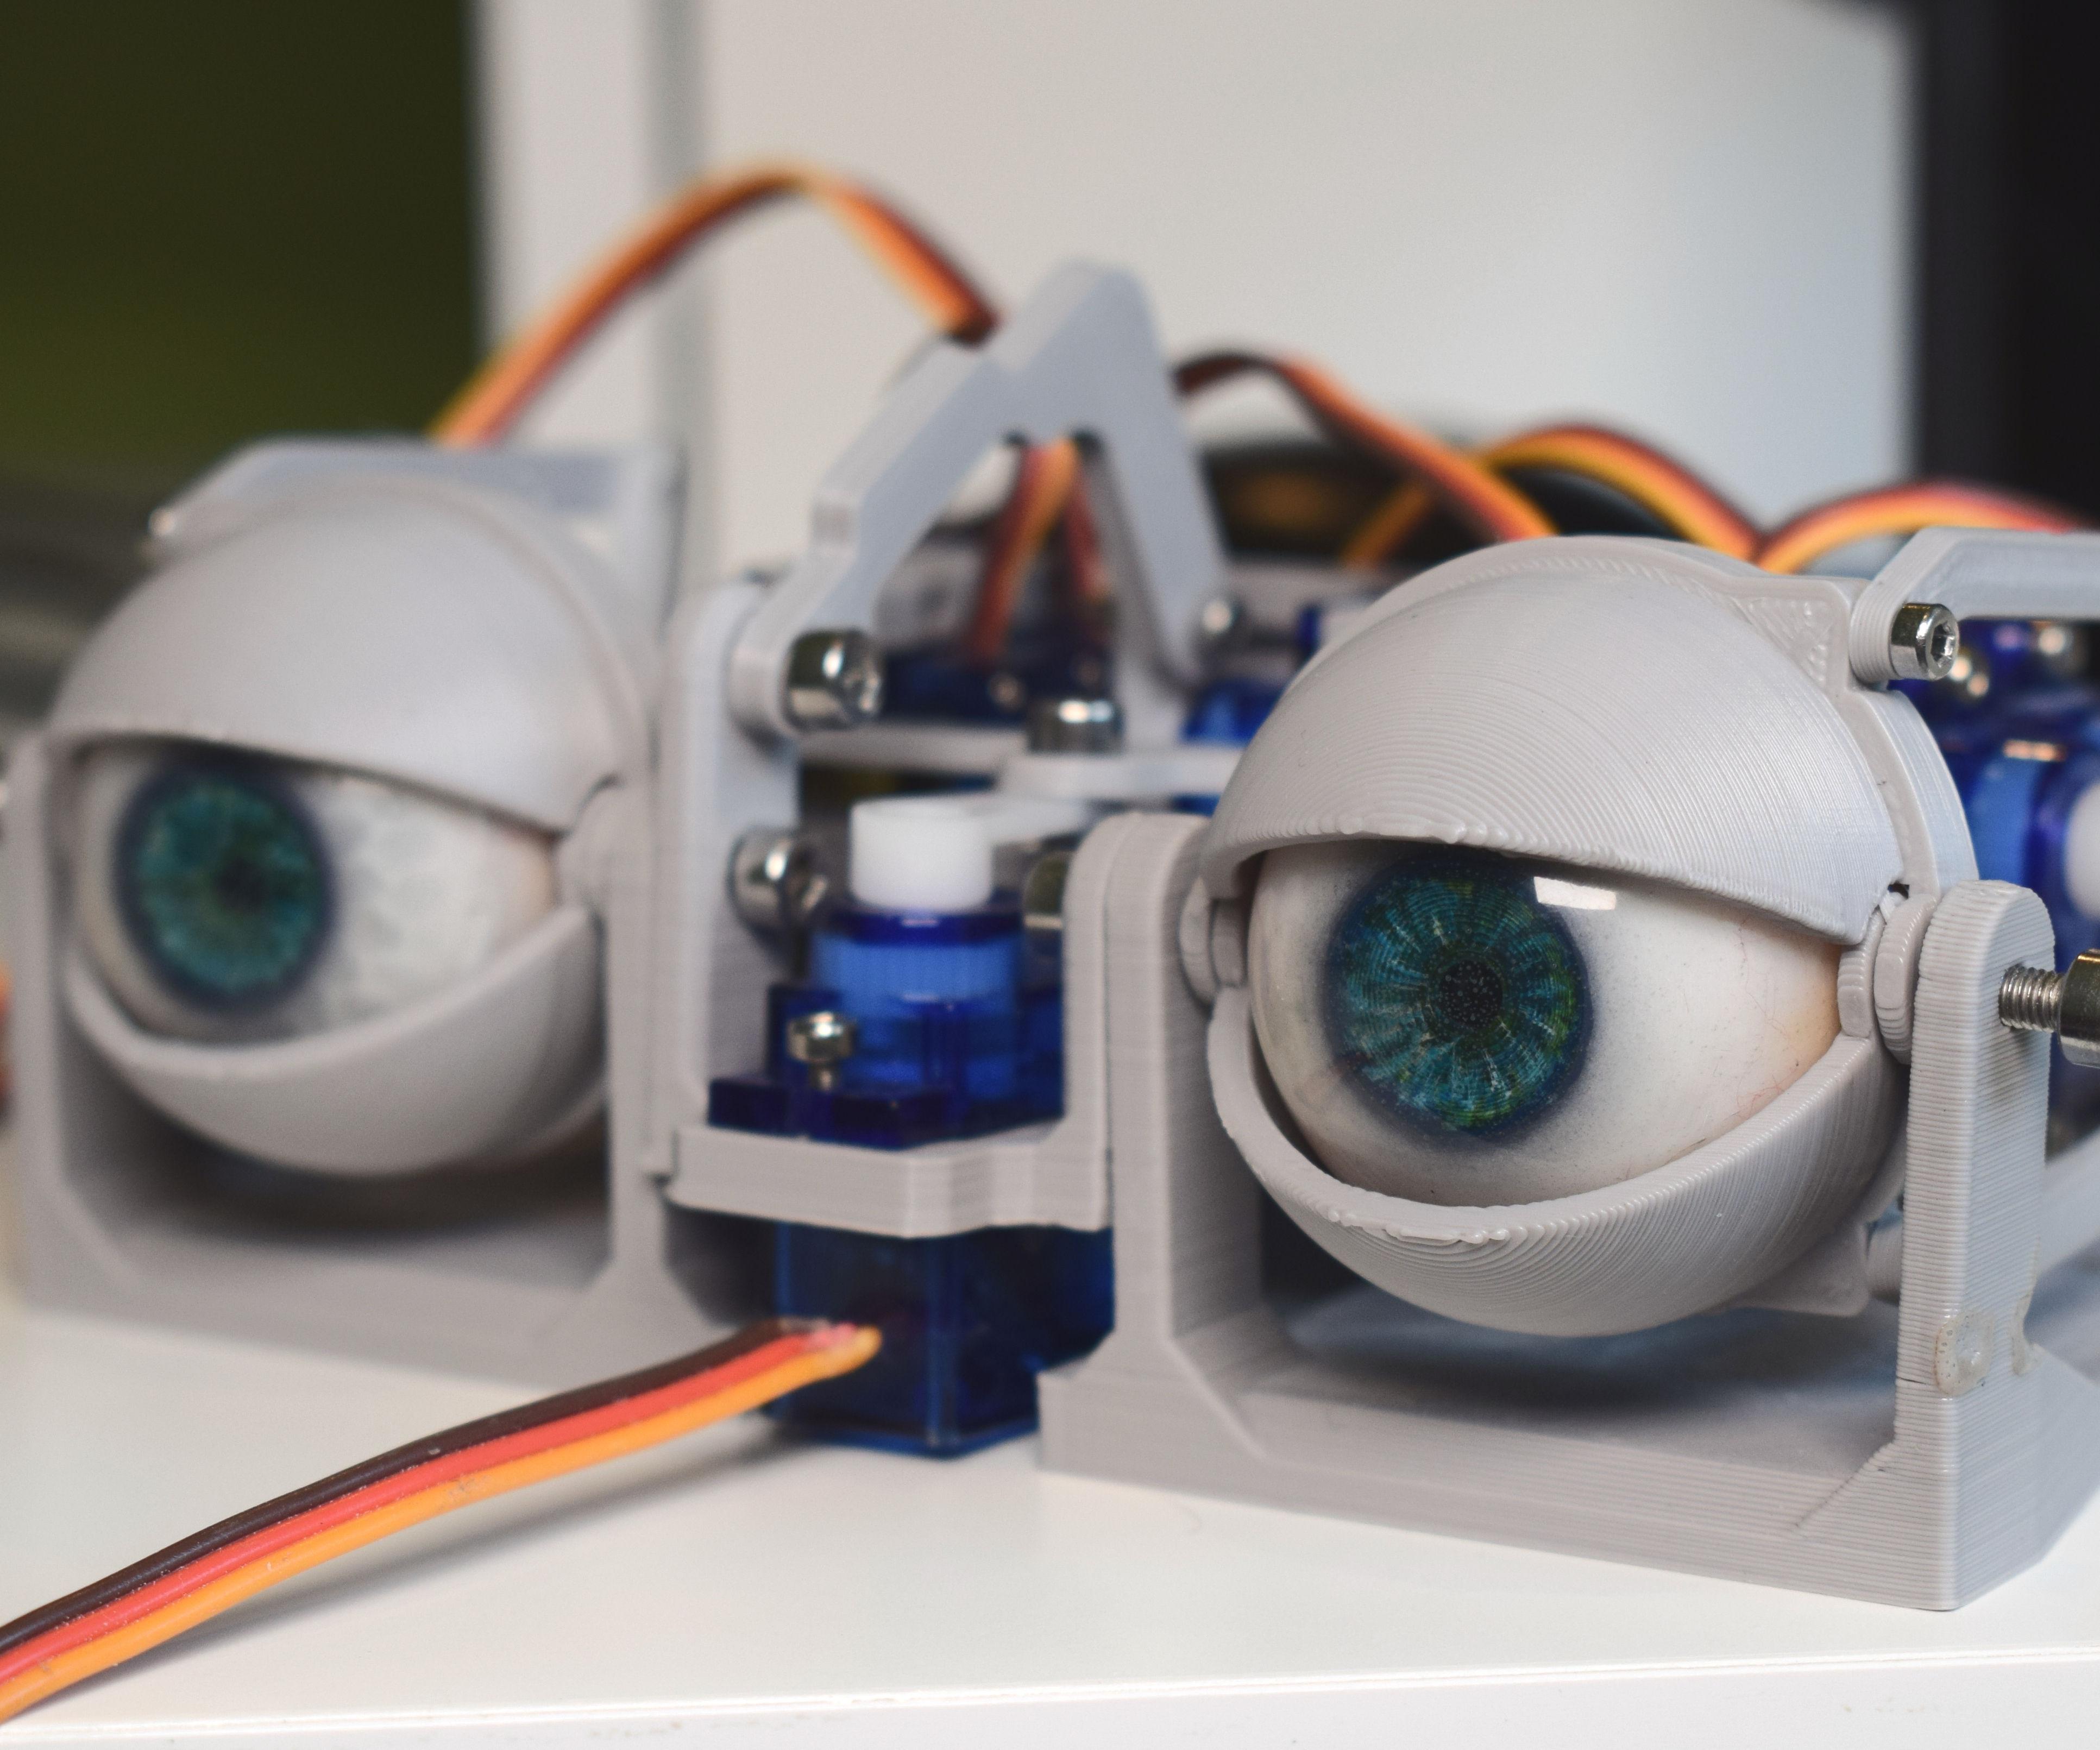 Simplified 3D Printed Animatronic Dual Eye Mechanism